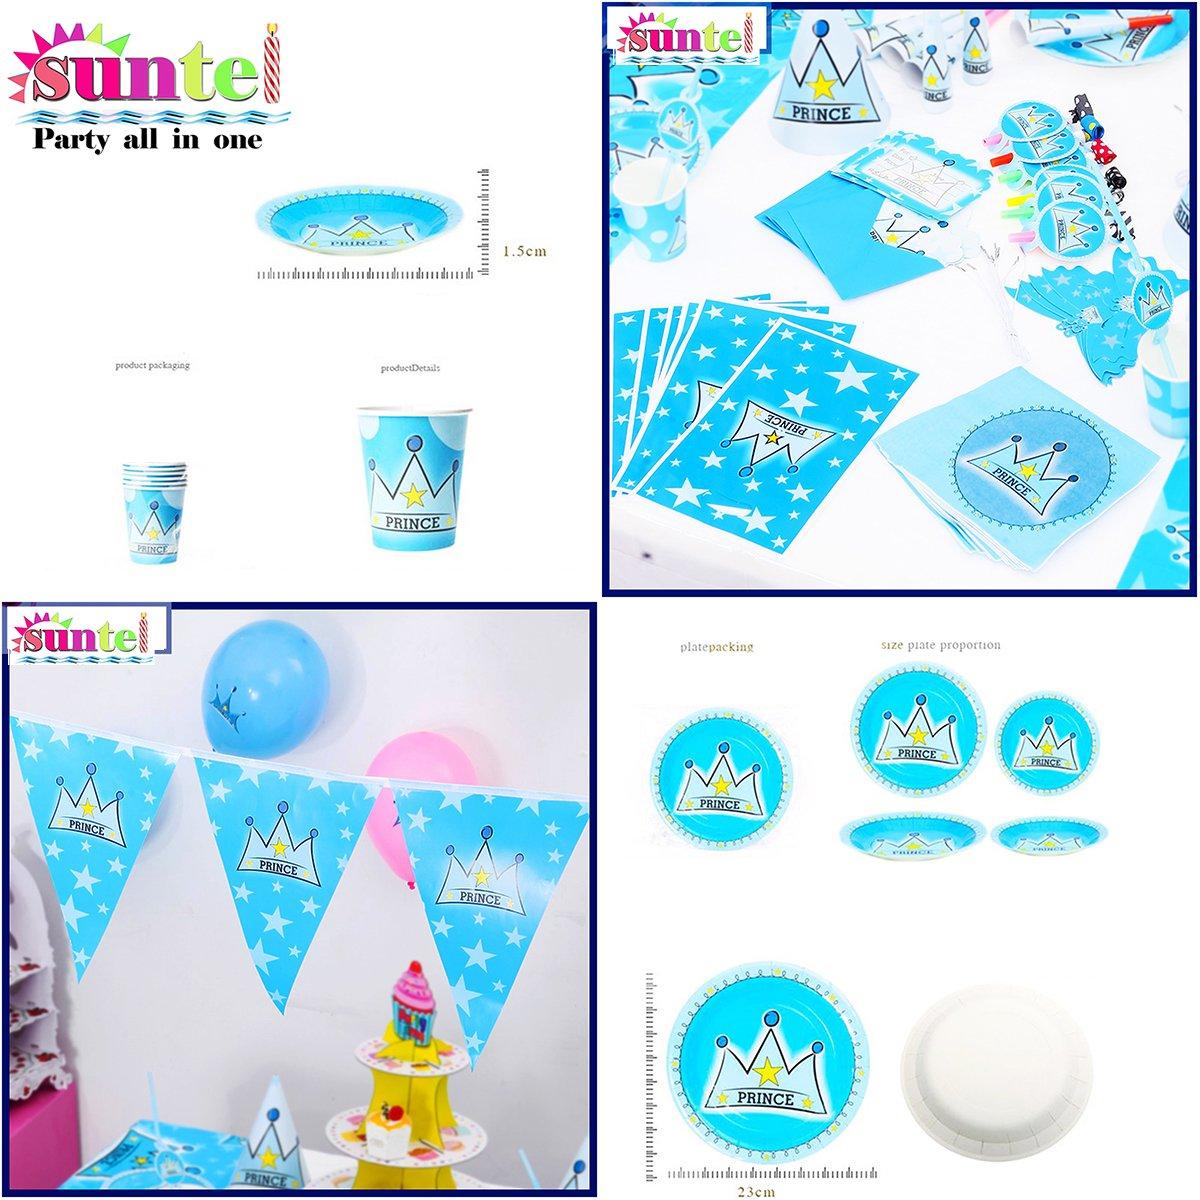 Amazon.com: Suntel Prince Birthday Party Decoration 16 Item 84 ...